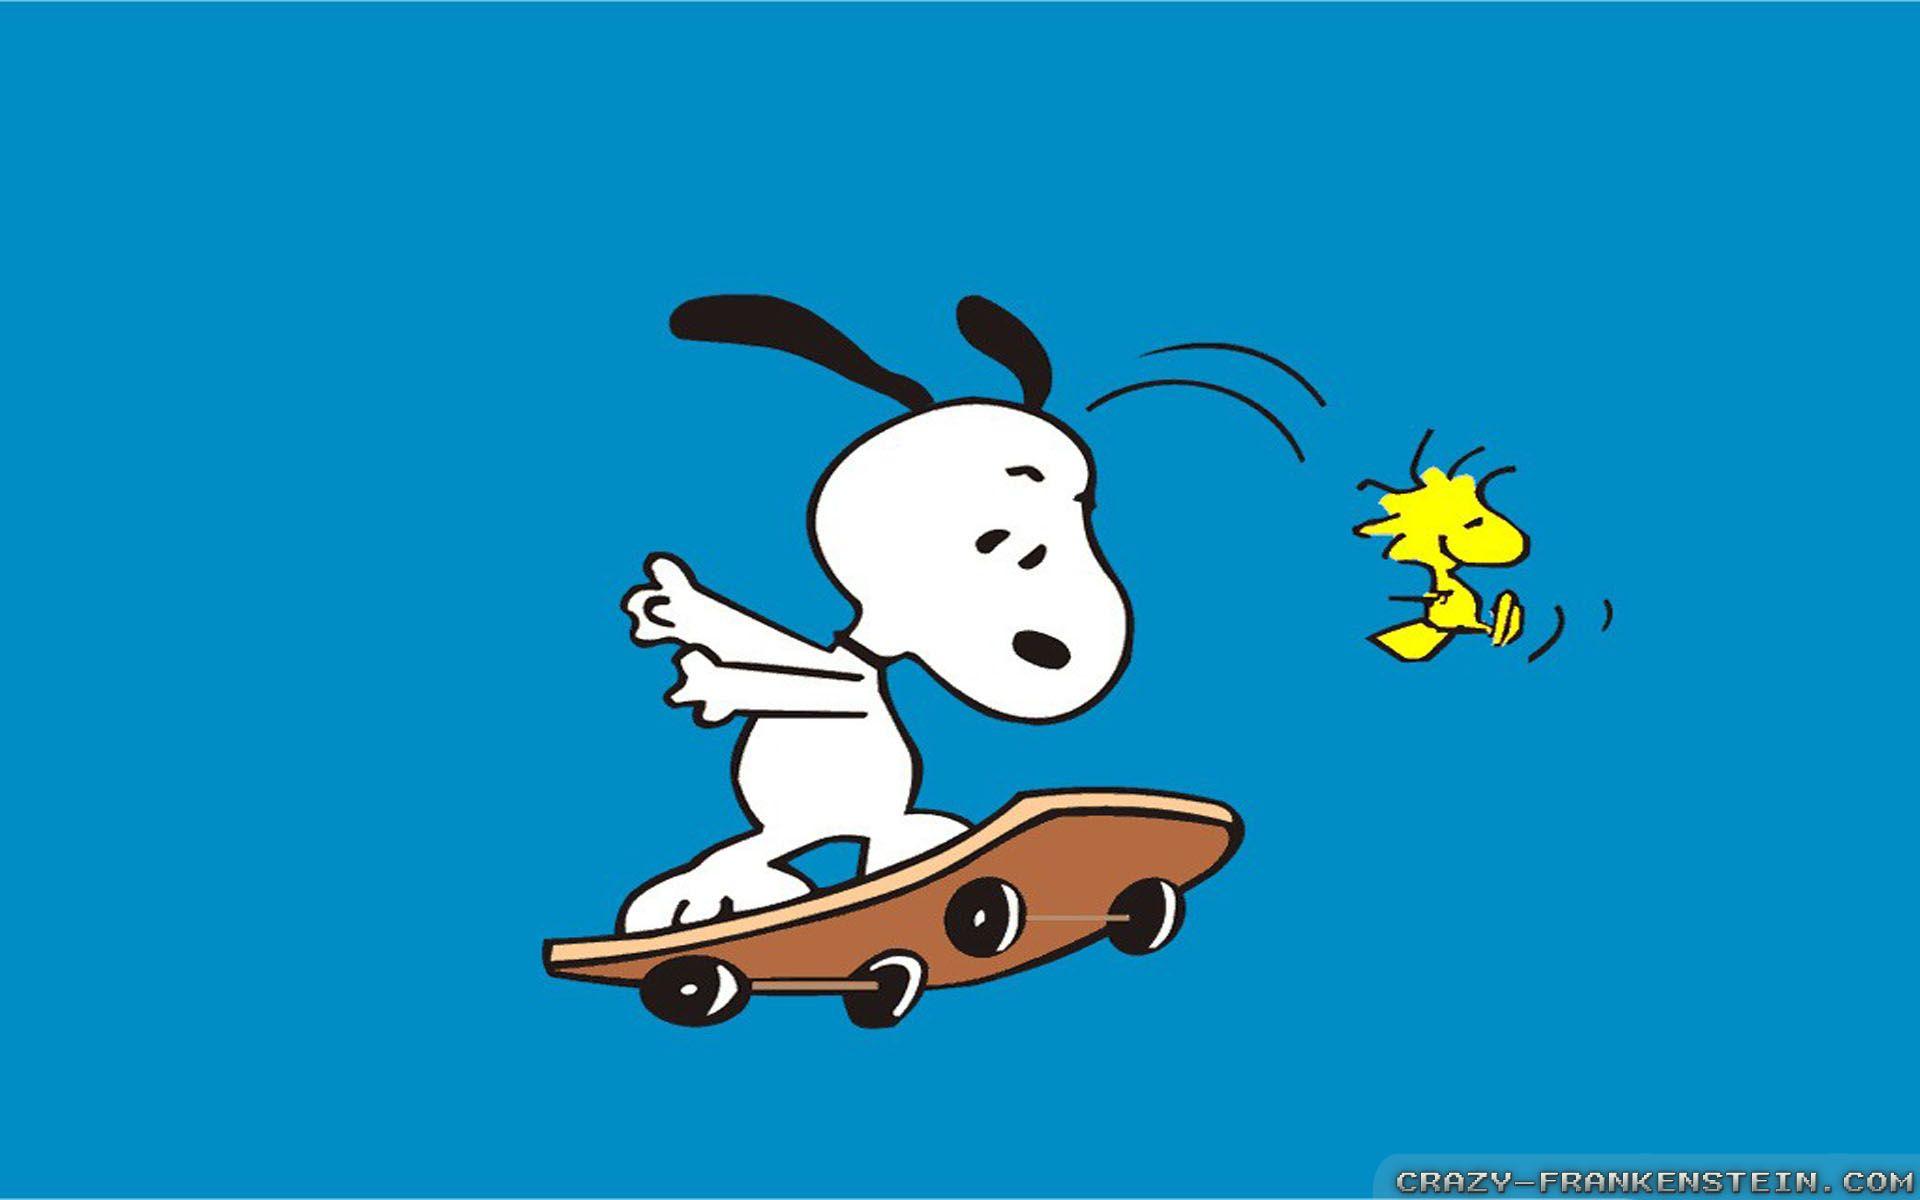 Snoopy Wallpaper Pesquisa Google Papel De Parede Do Snoopy Walpaper Para Pc Imagens Para Pc